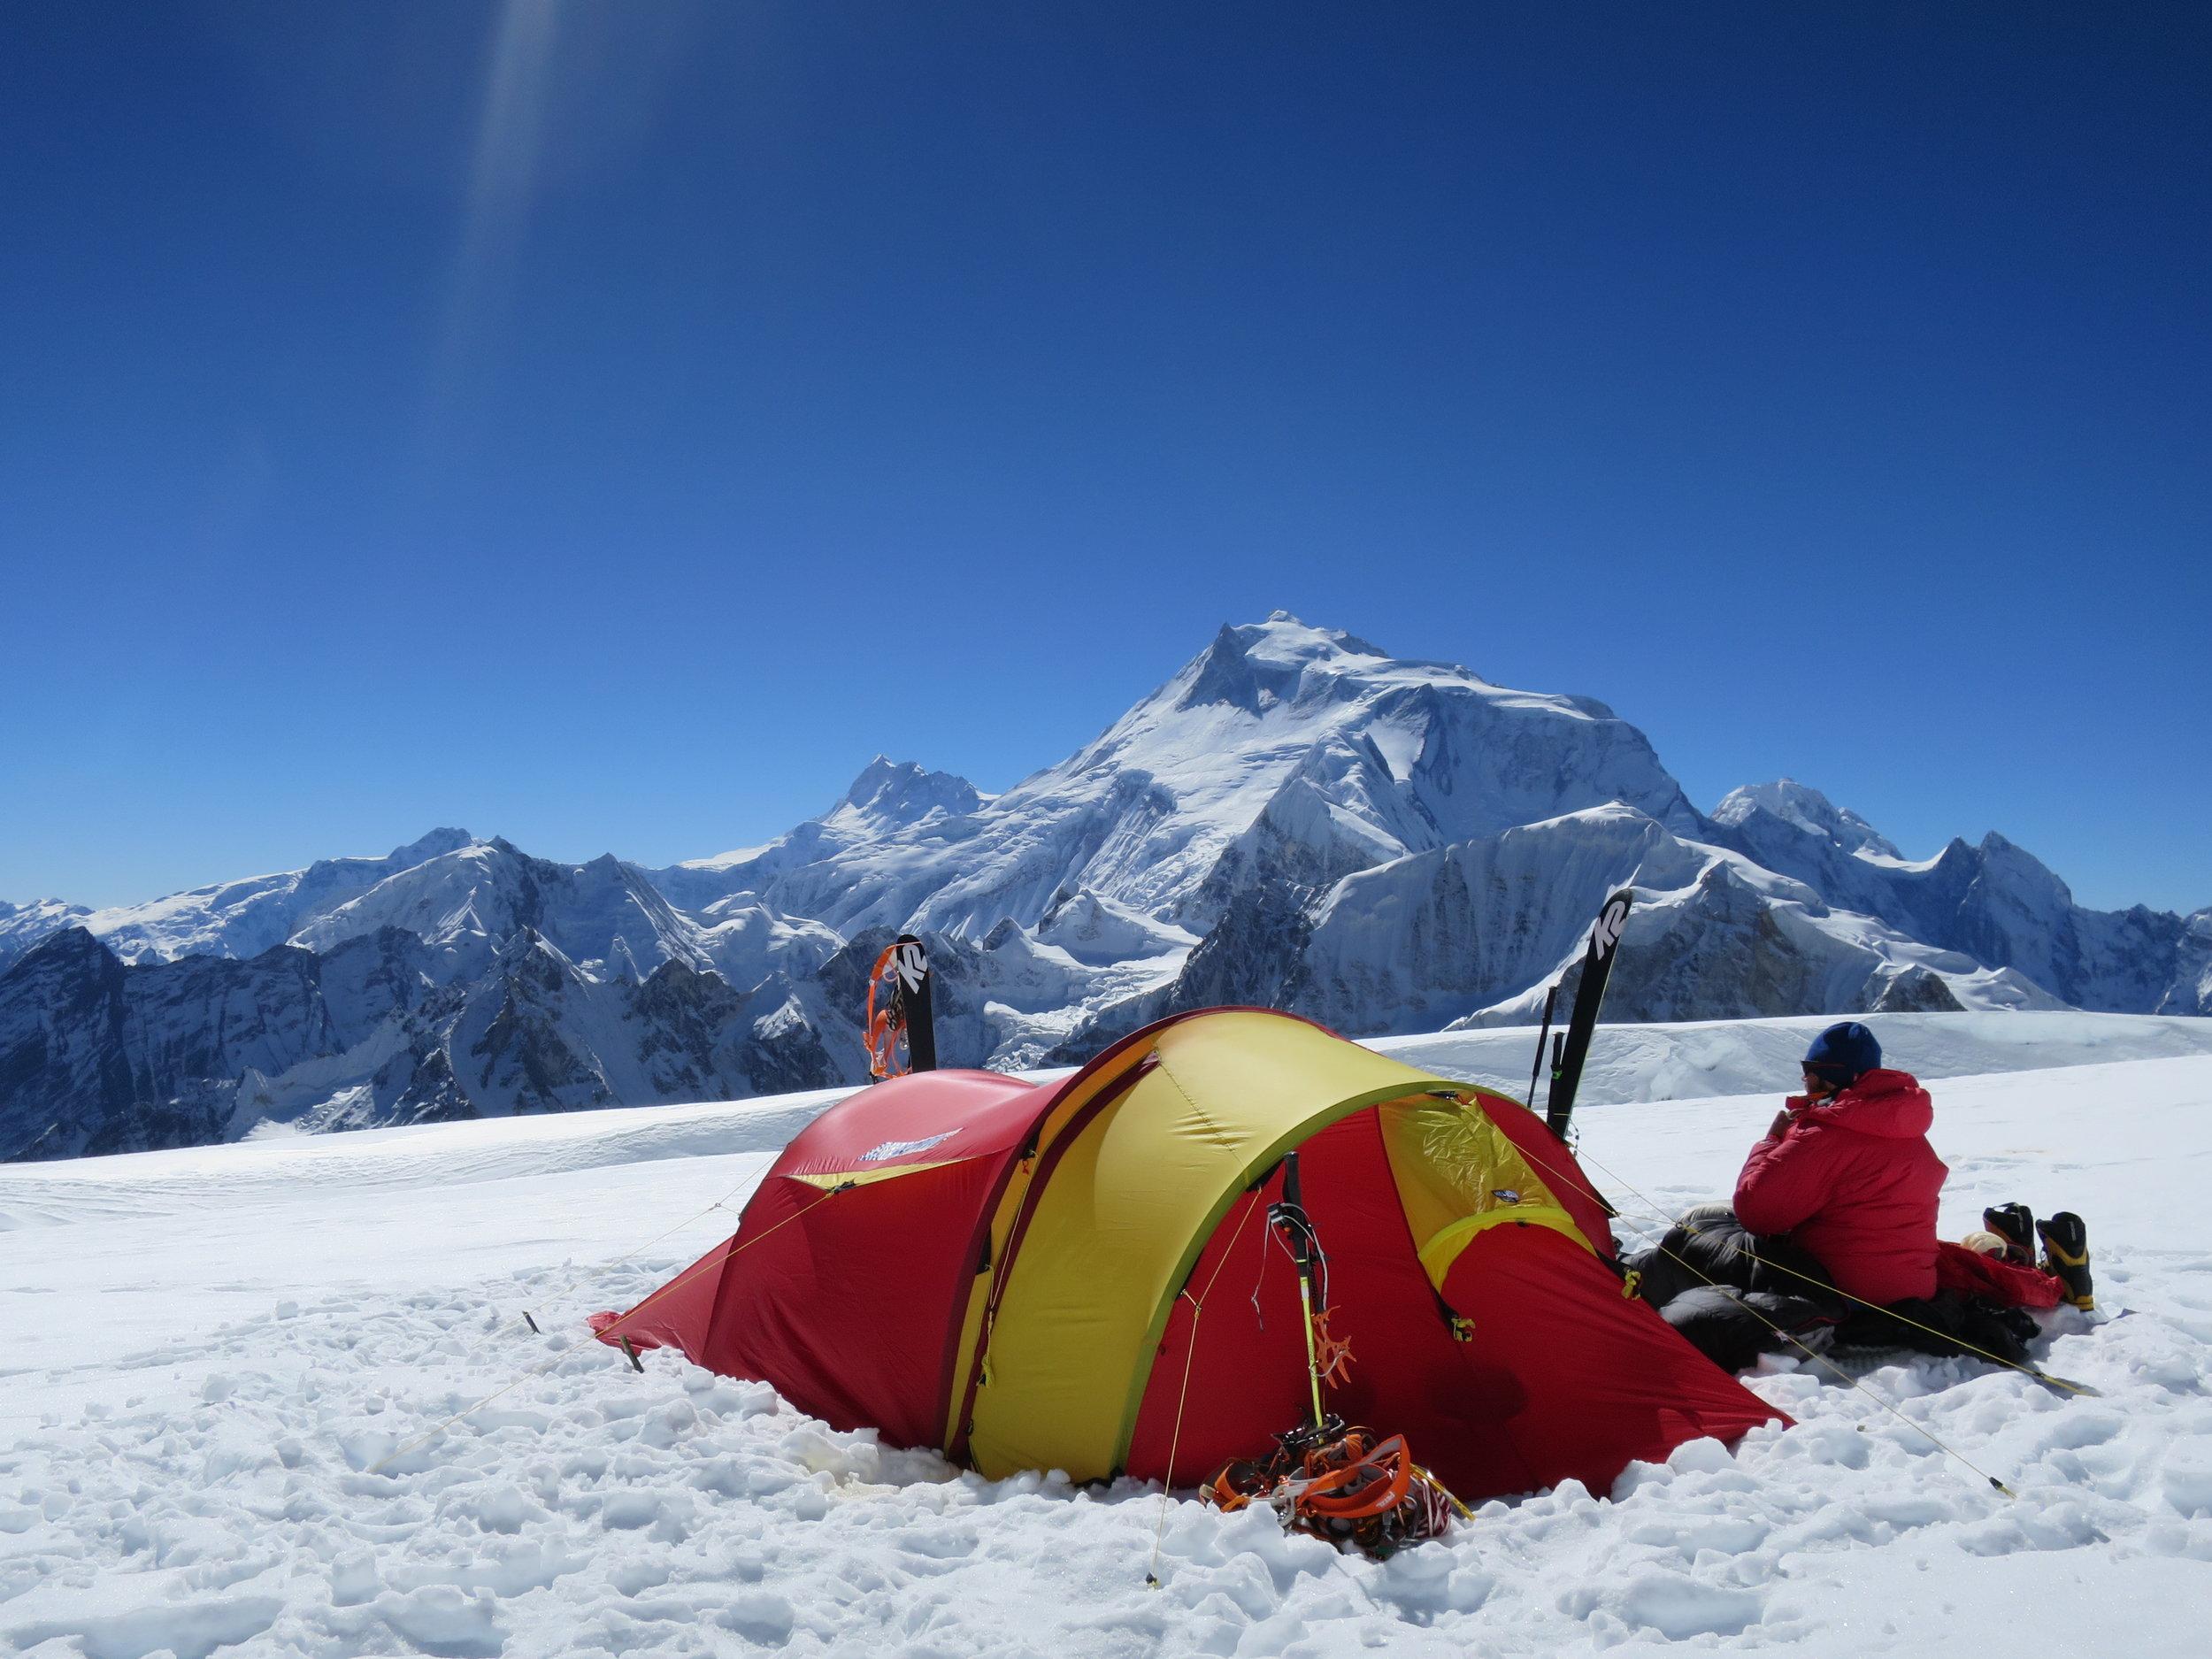 The wiev from our tent on 6000 meters on Pawar Himal. foto jørgen aamot - MAM.jpg